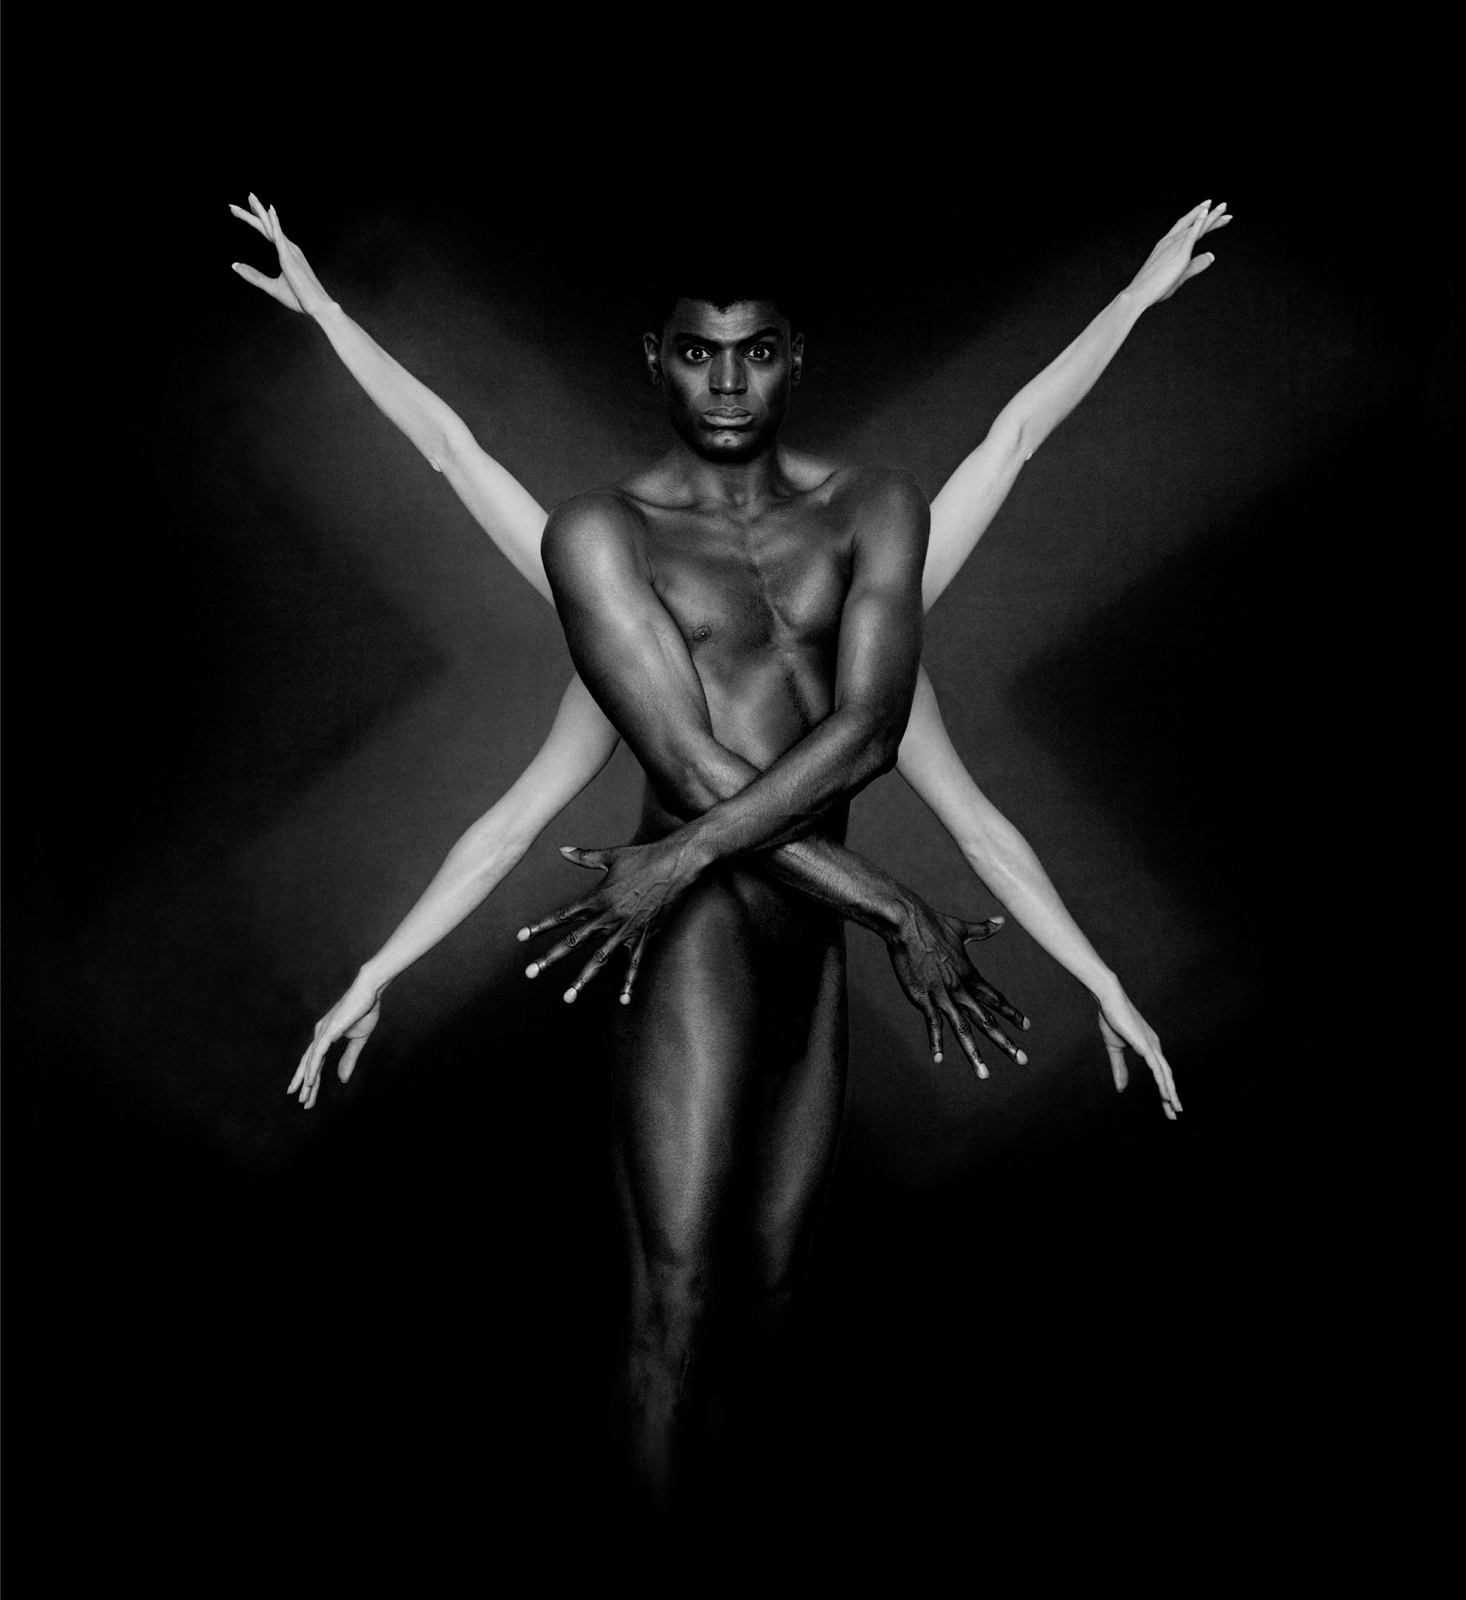 Фото балет голышом 1 фотография